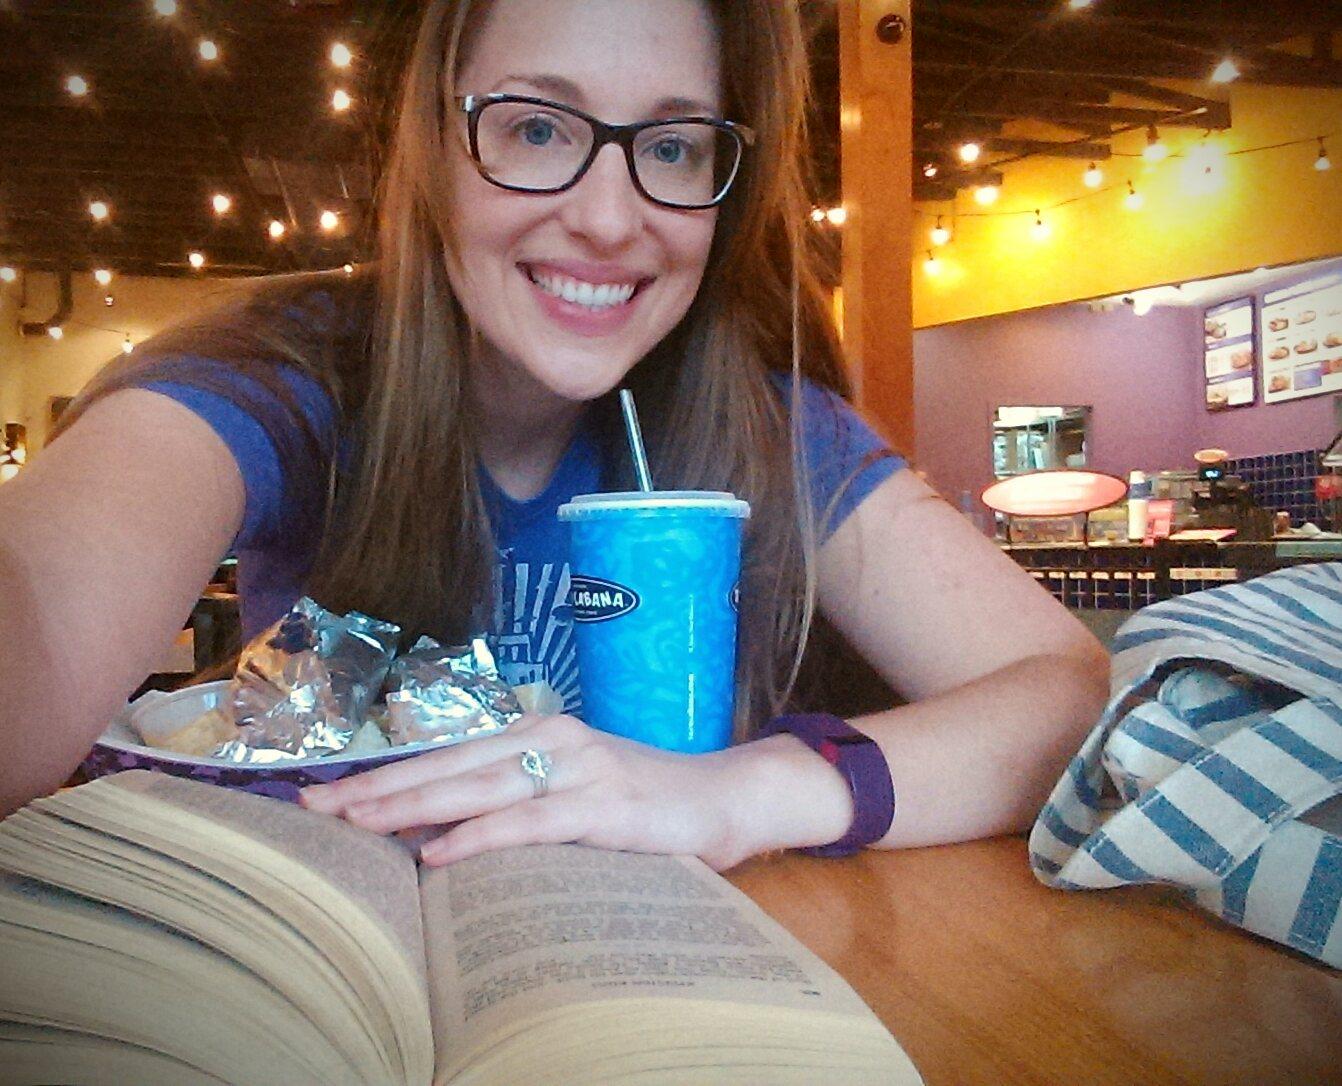 Reading book at restuarant